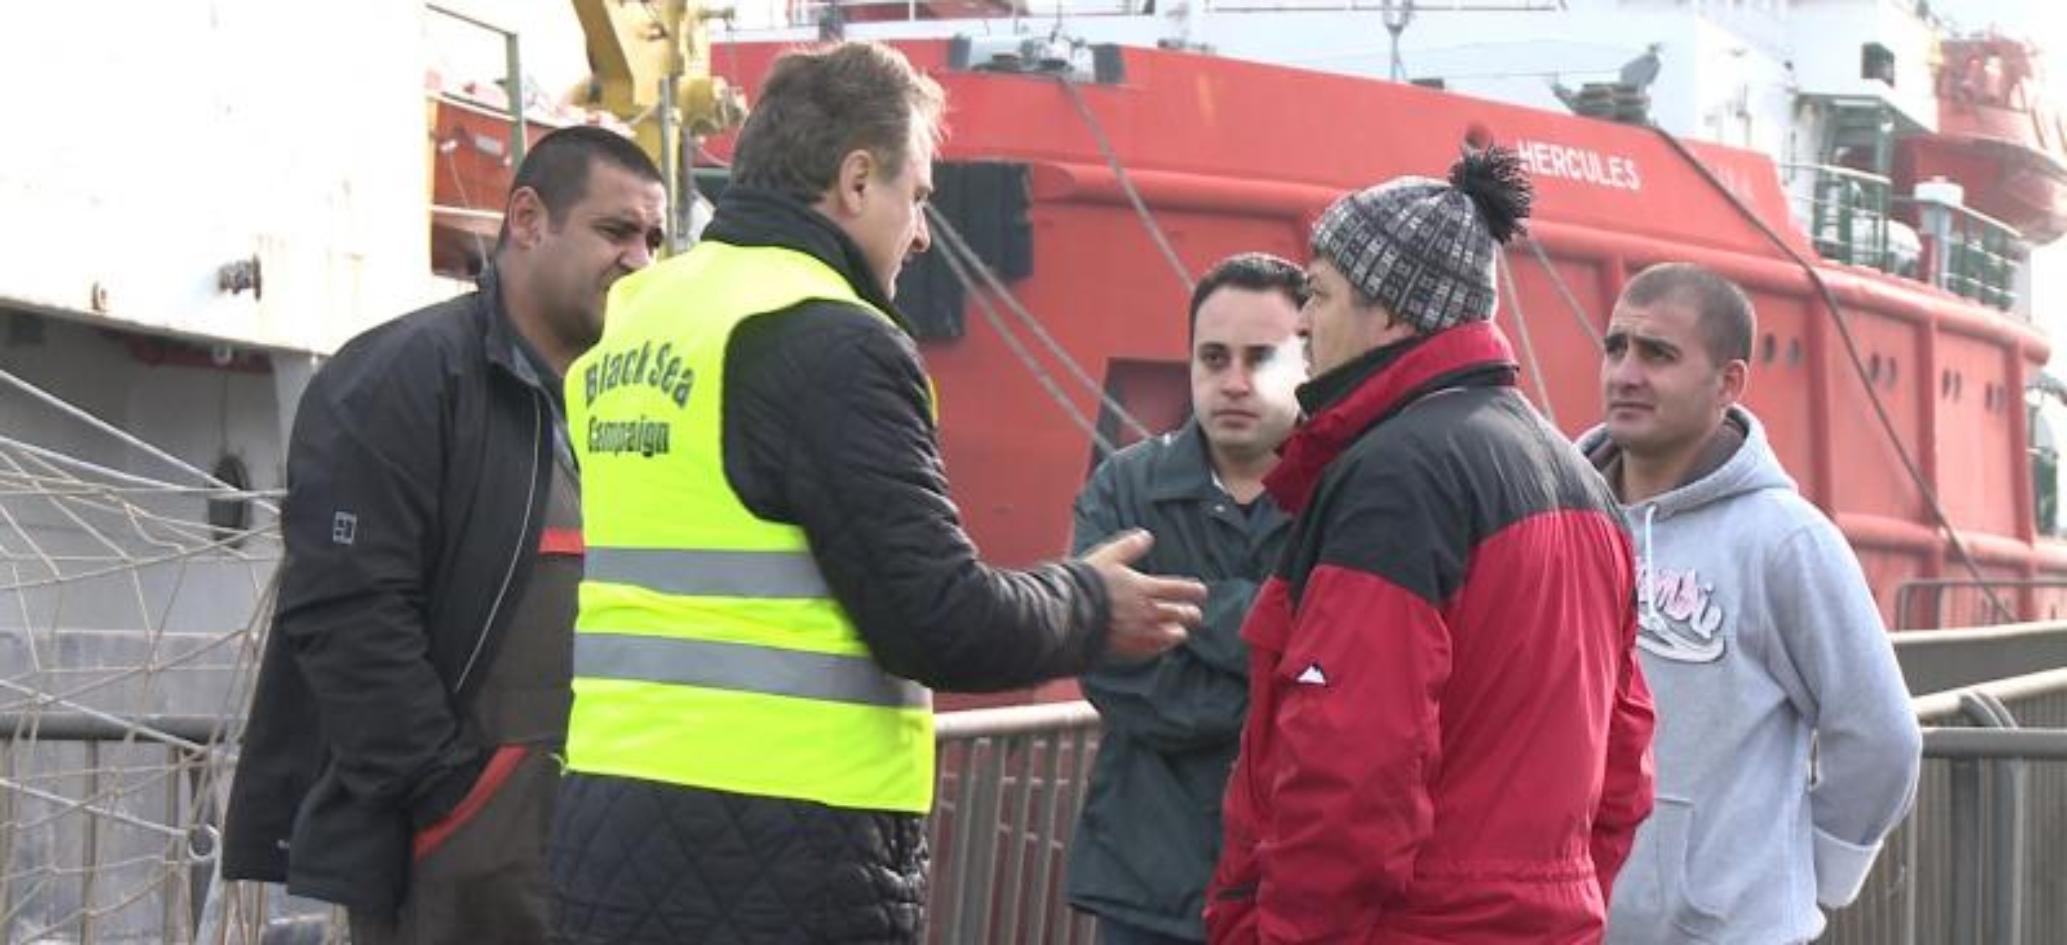 Abandoned seafarers: victims of modern slavery?